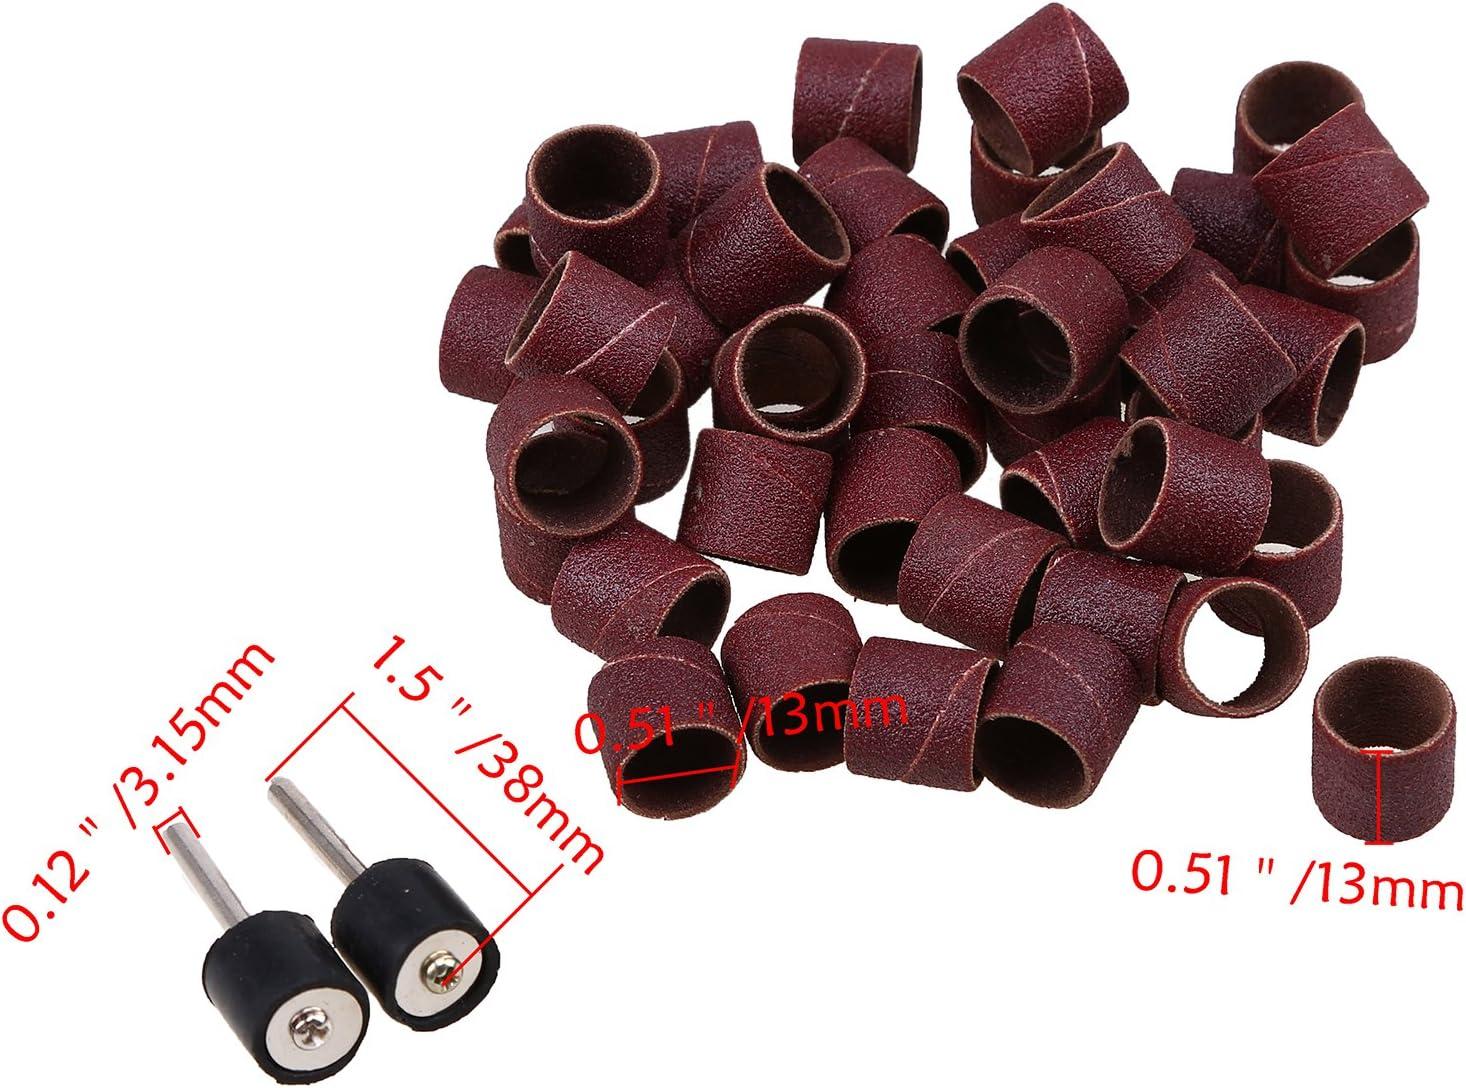 150 grit 240 grit Sanding Bands Sleeves Sanding Drum Kit 80 grit 2-240# 50 Pcs for Dremel Rotary Tool 120 grit 180 grit 320 grit